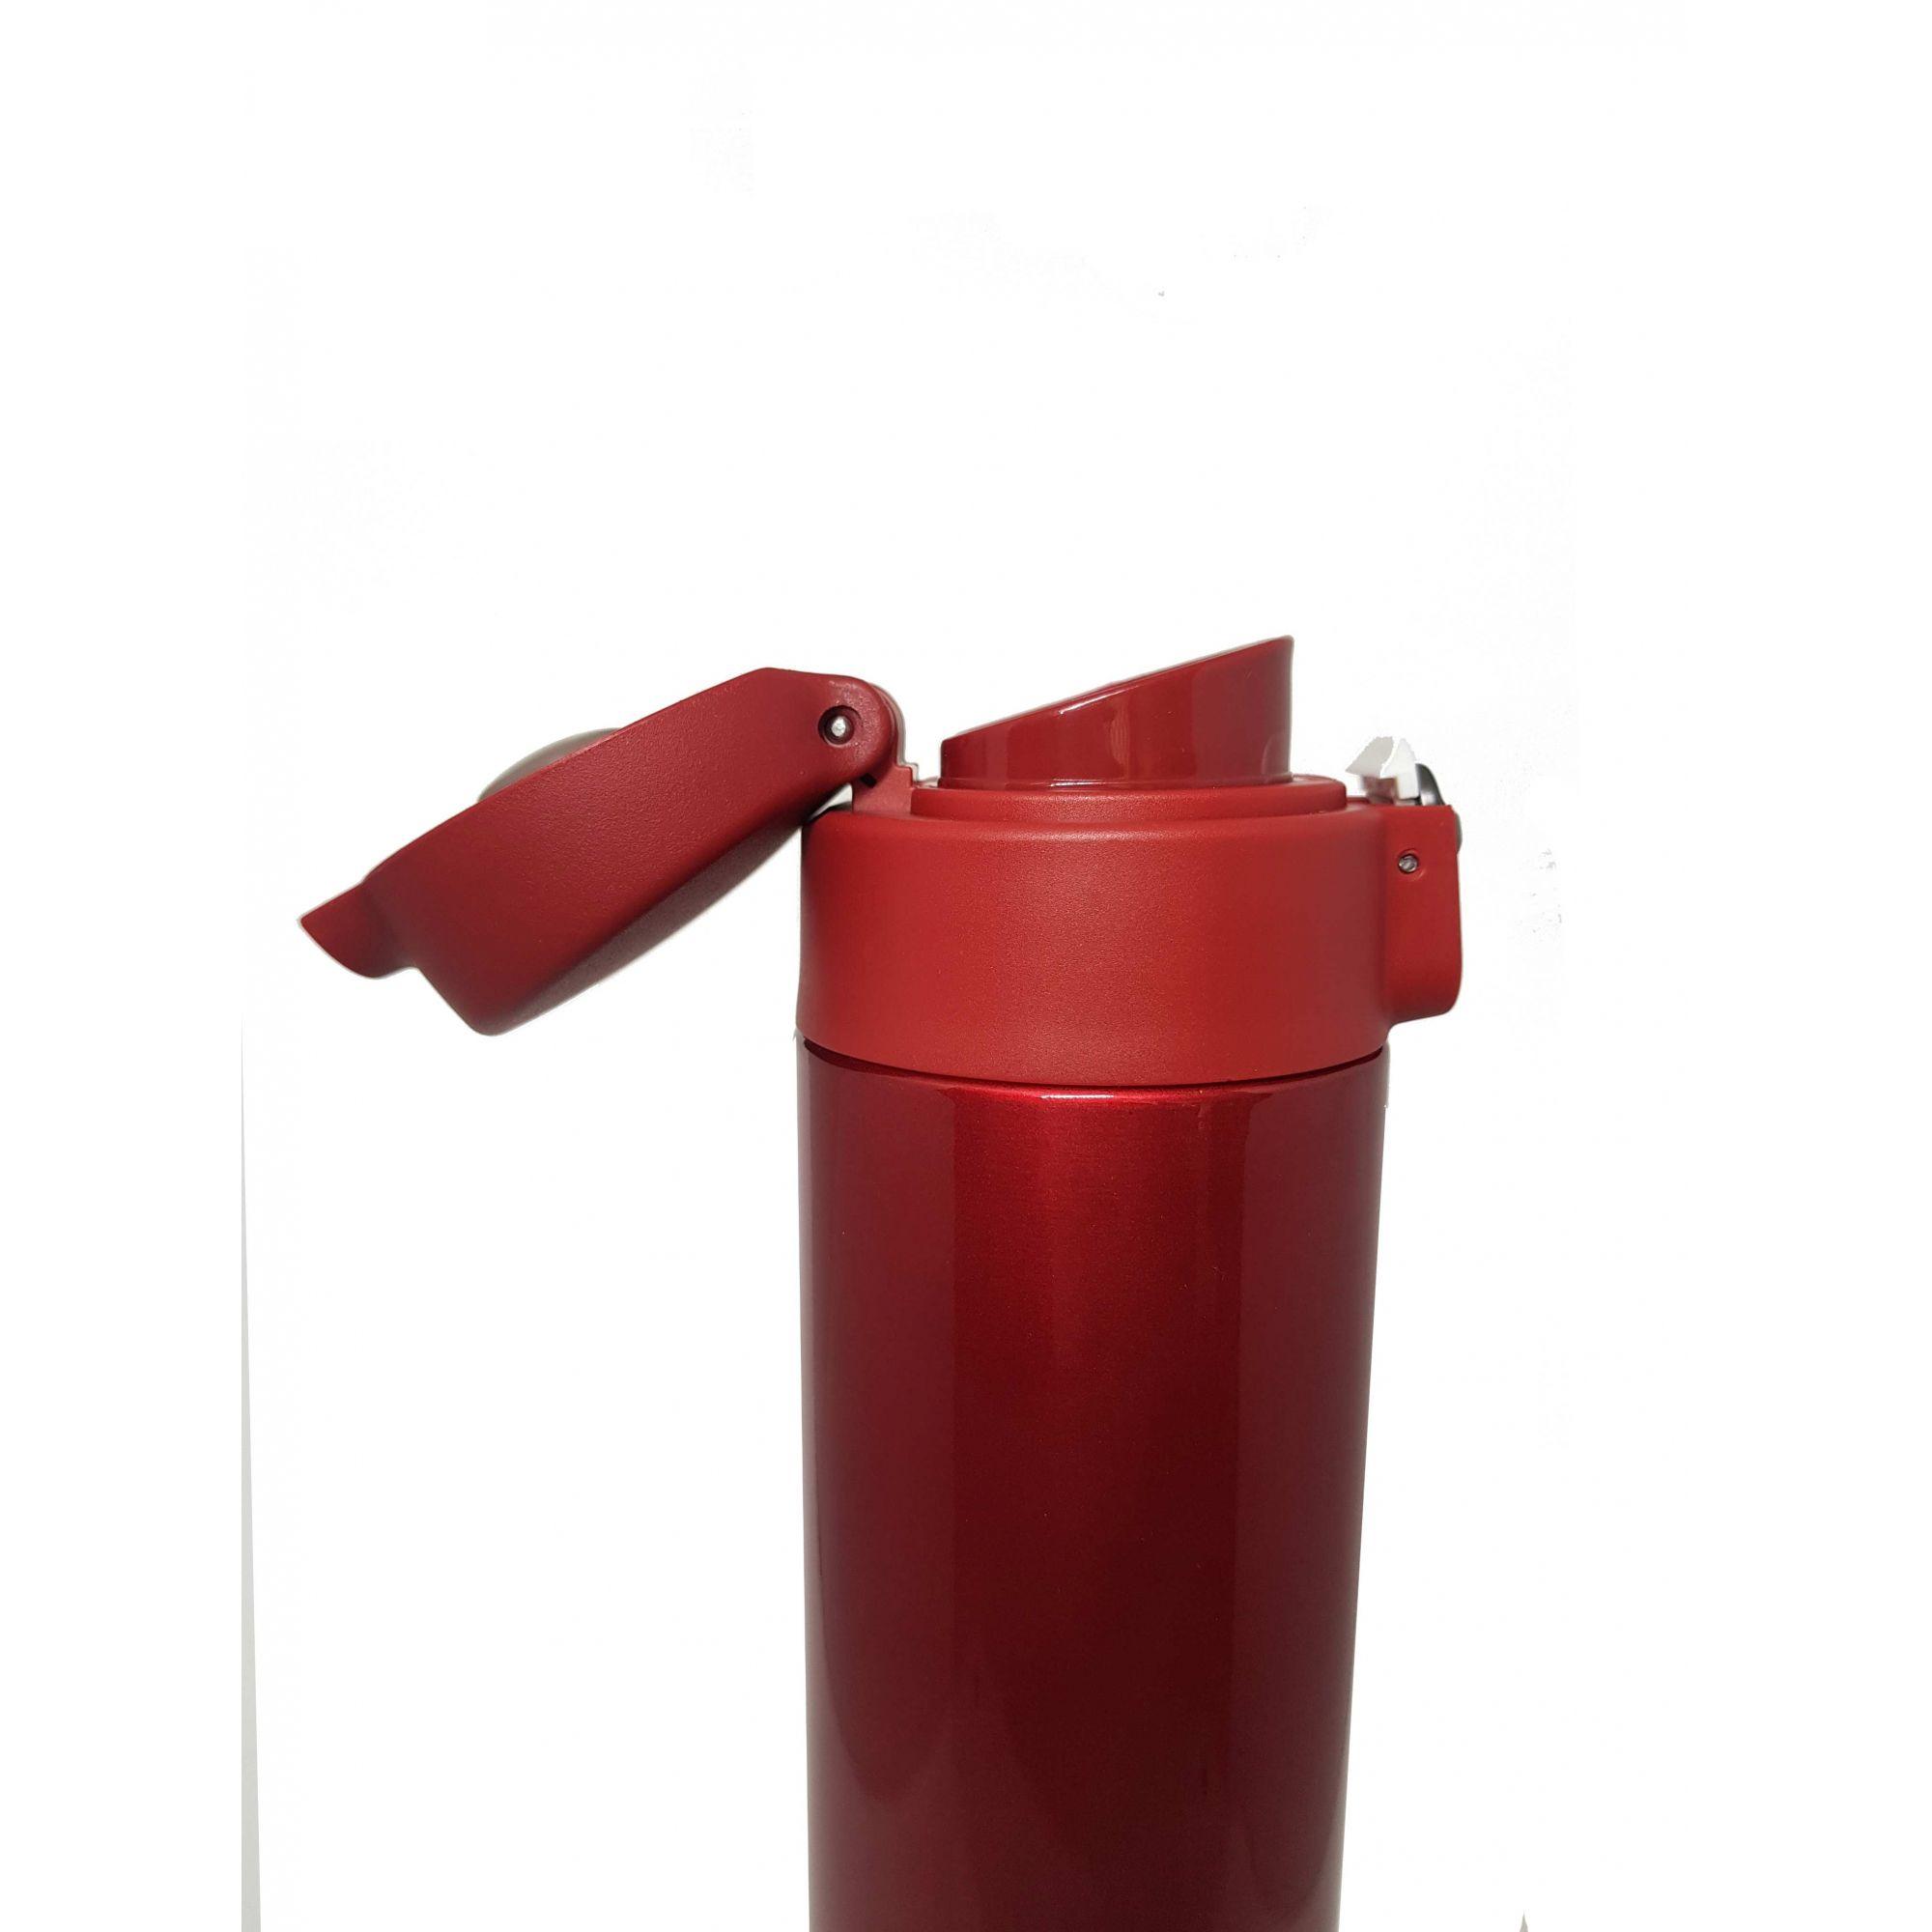 Garrafa Térmica de Inox - 500ml Vermelha